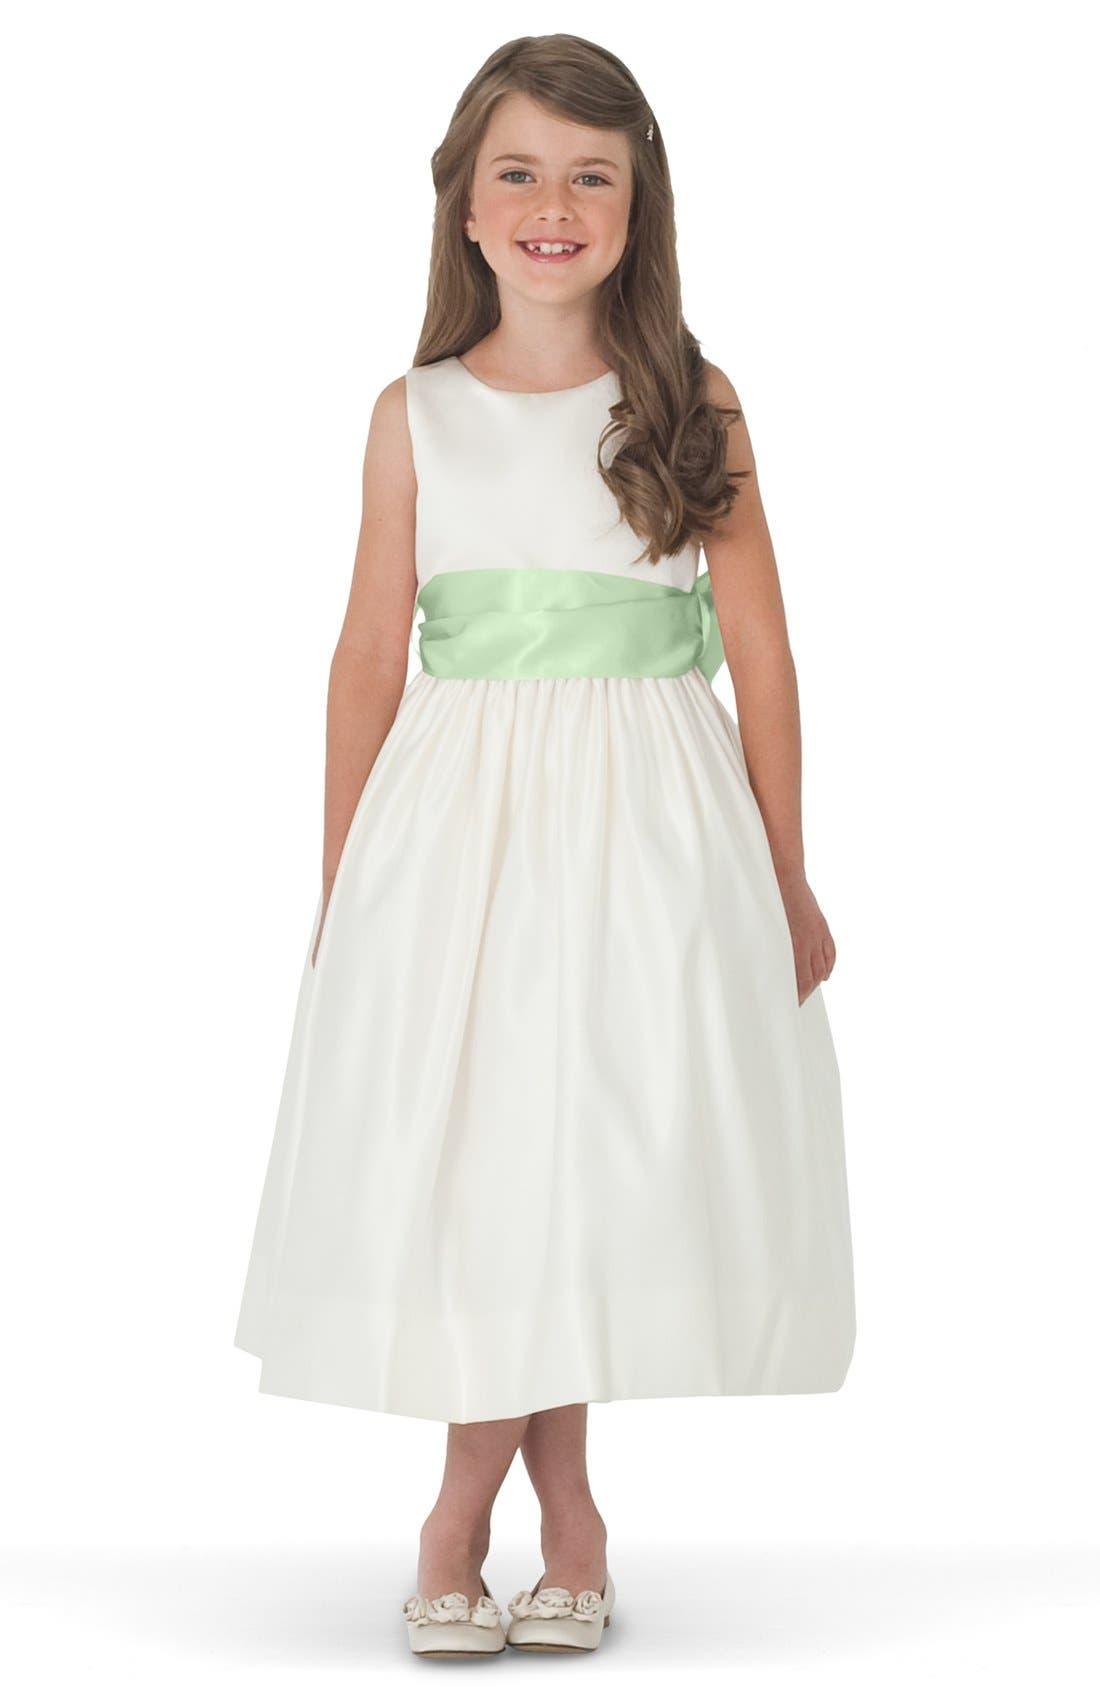 Main Image - Us Angels Sleeveless Satin Dress with Contrast Sash (Toddler Girls, Little Girls & Big Girls)